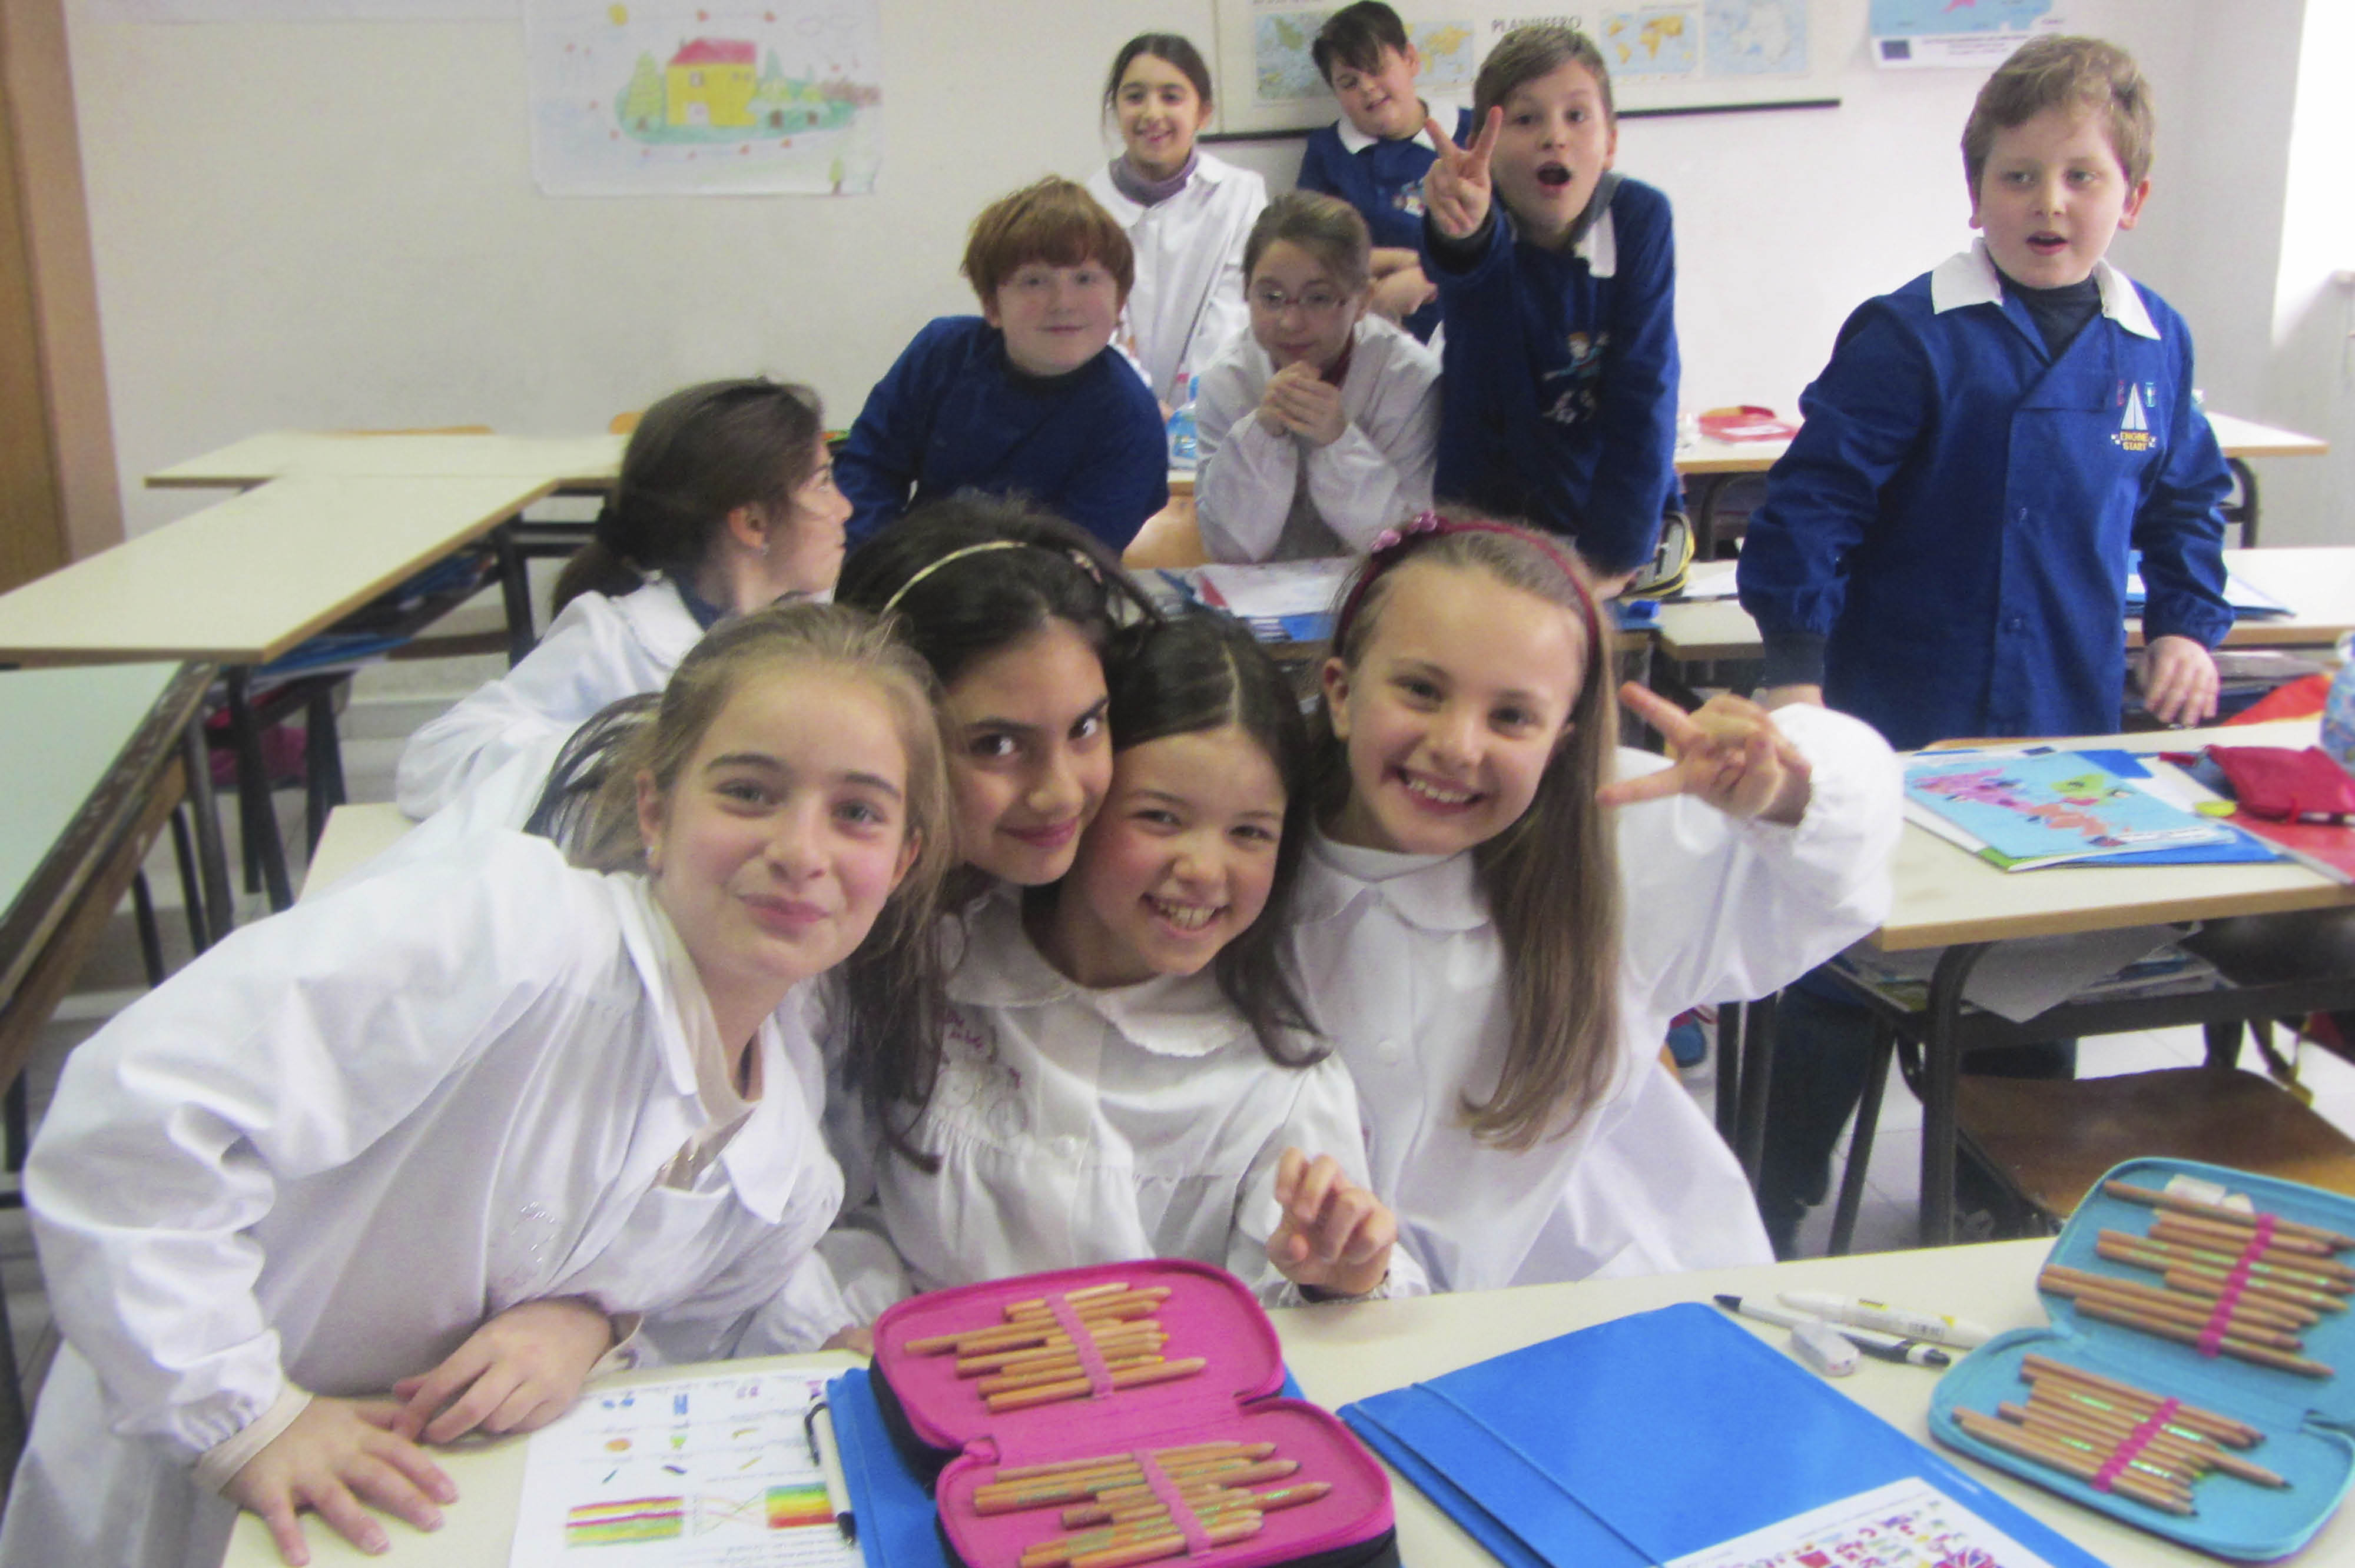 Benedict School Pomigliano d'Arco @ Somma23